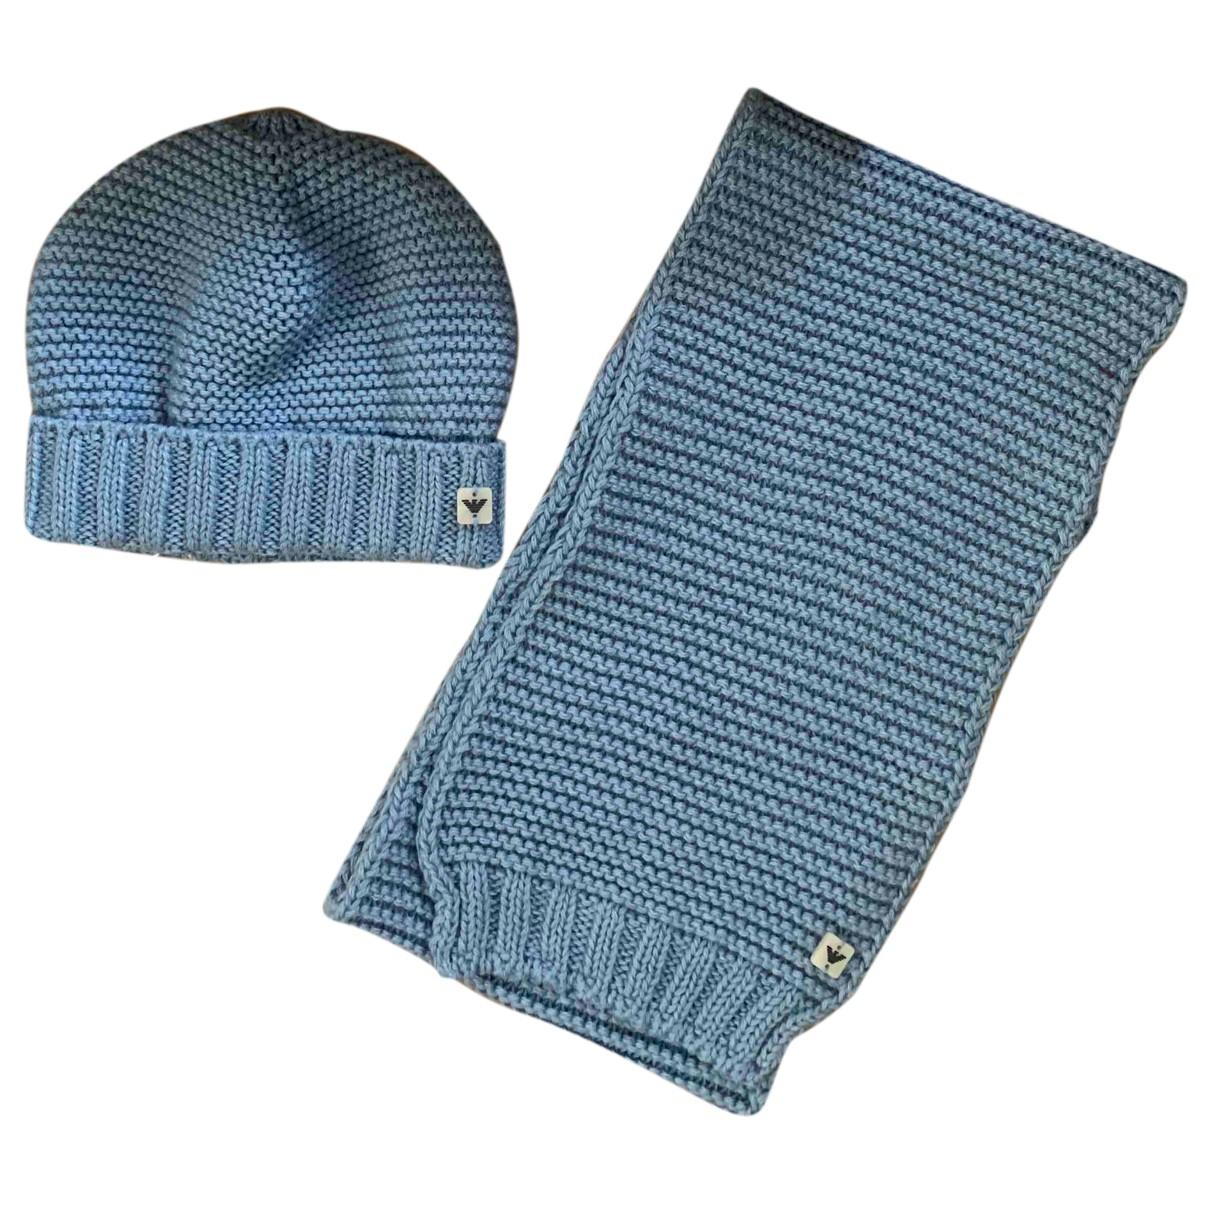 Giorgio Armani \N Hut, Muetzen, Handschuhe in  Blau Wolle